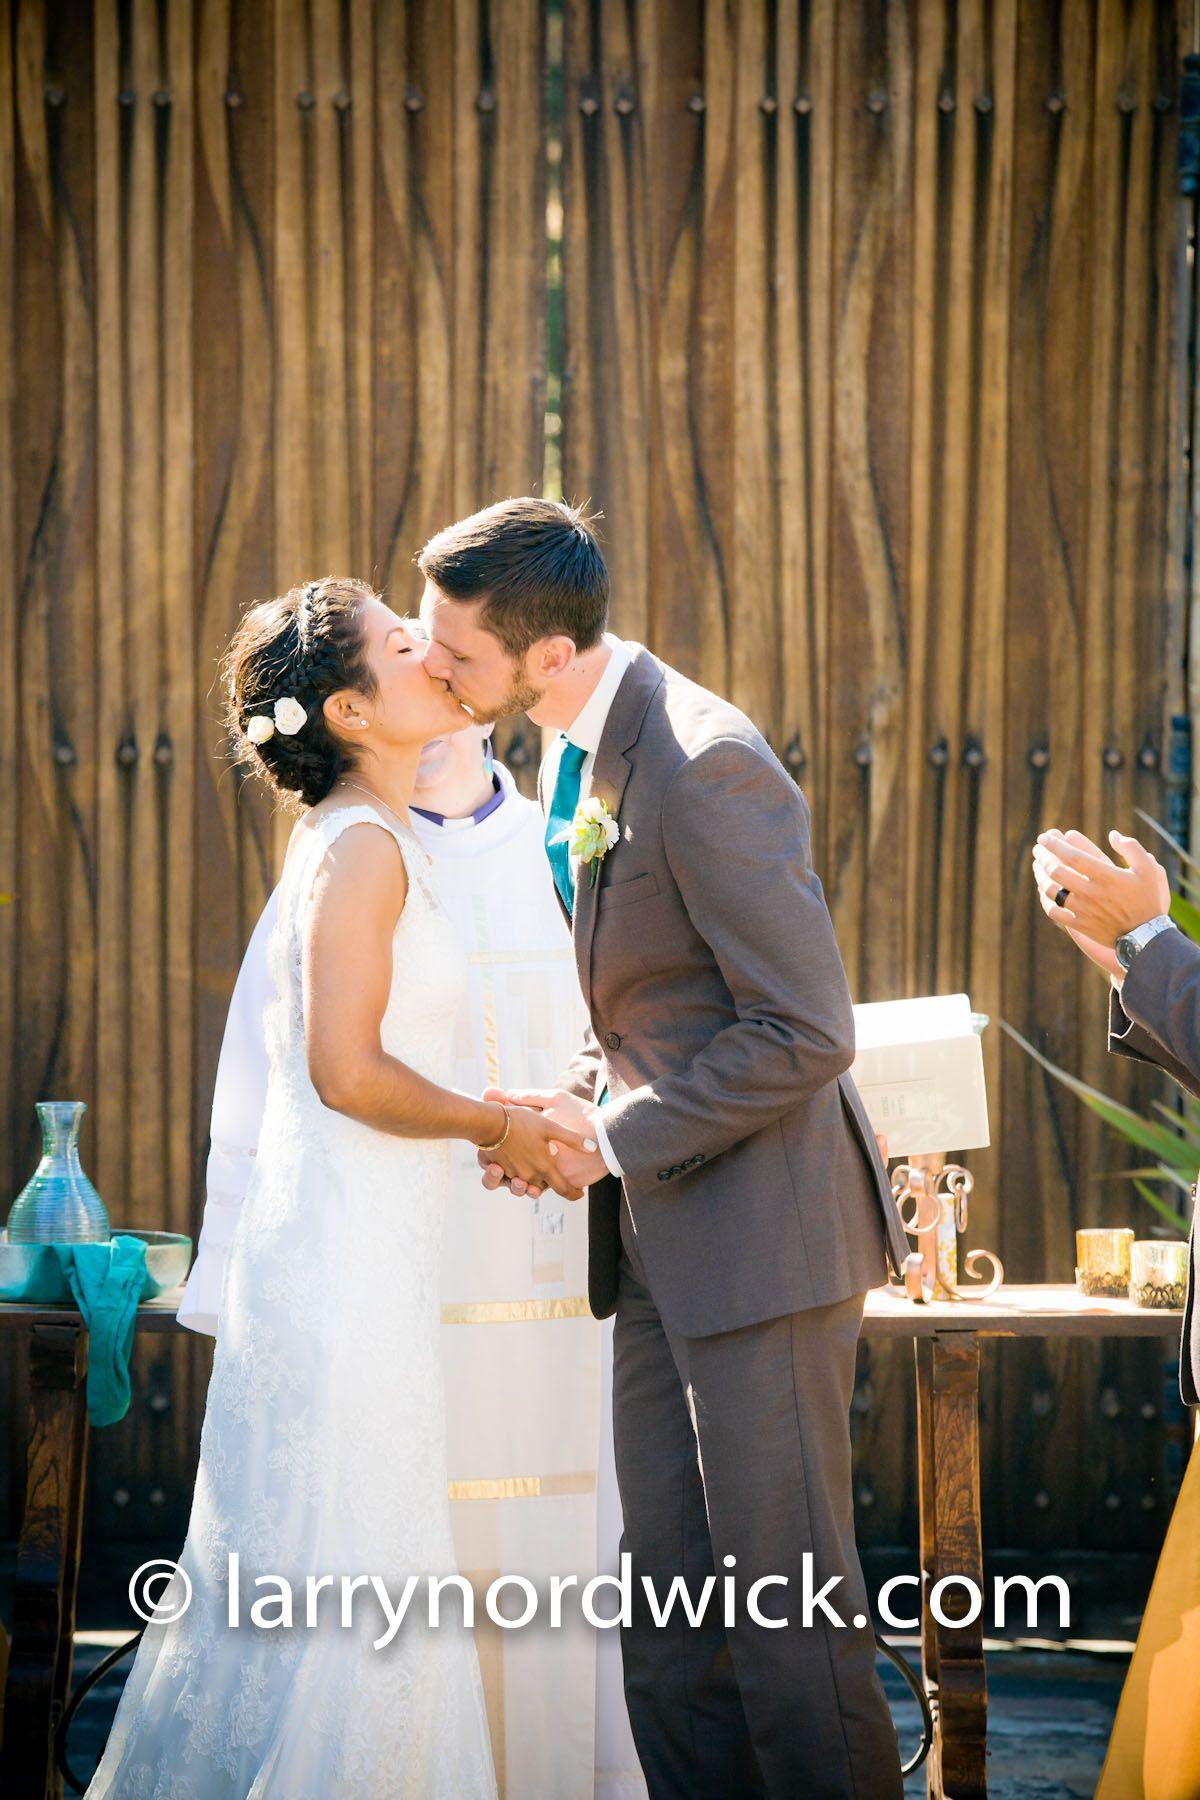 Nicklaus club wedding pasadera country club monterey ca